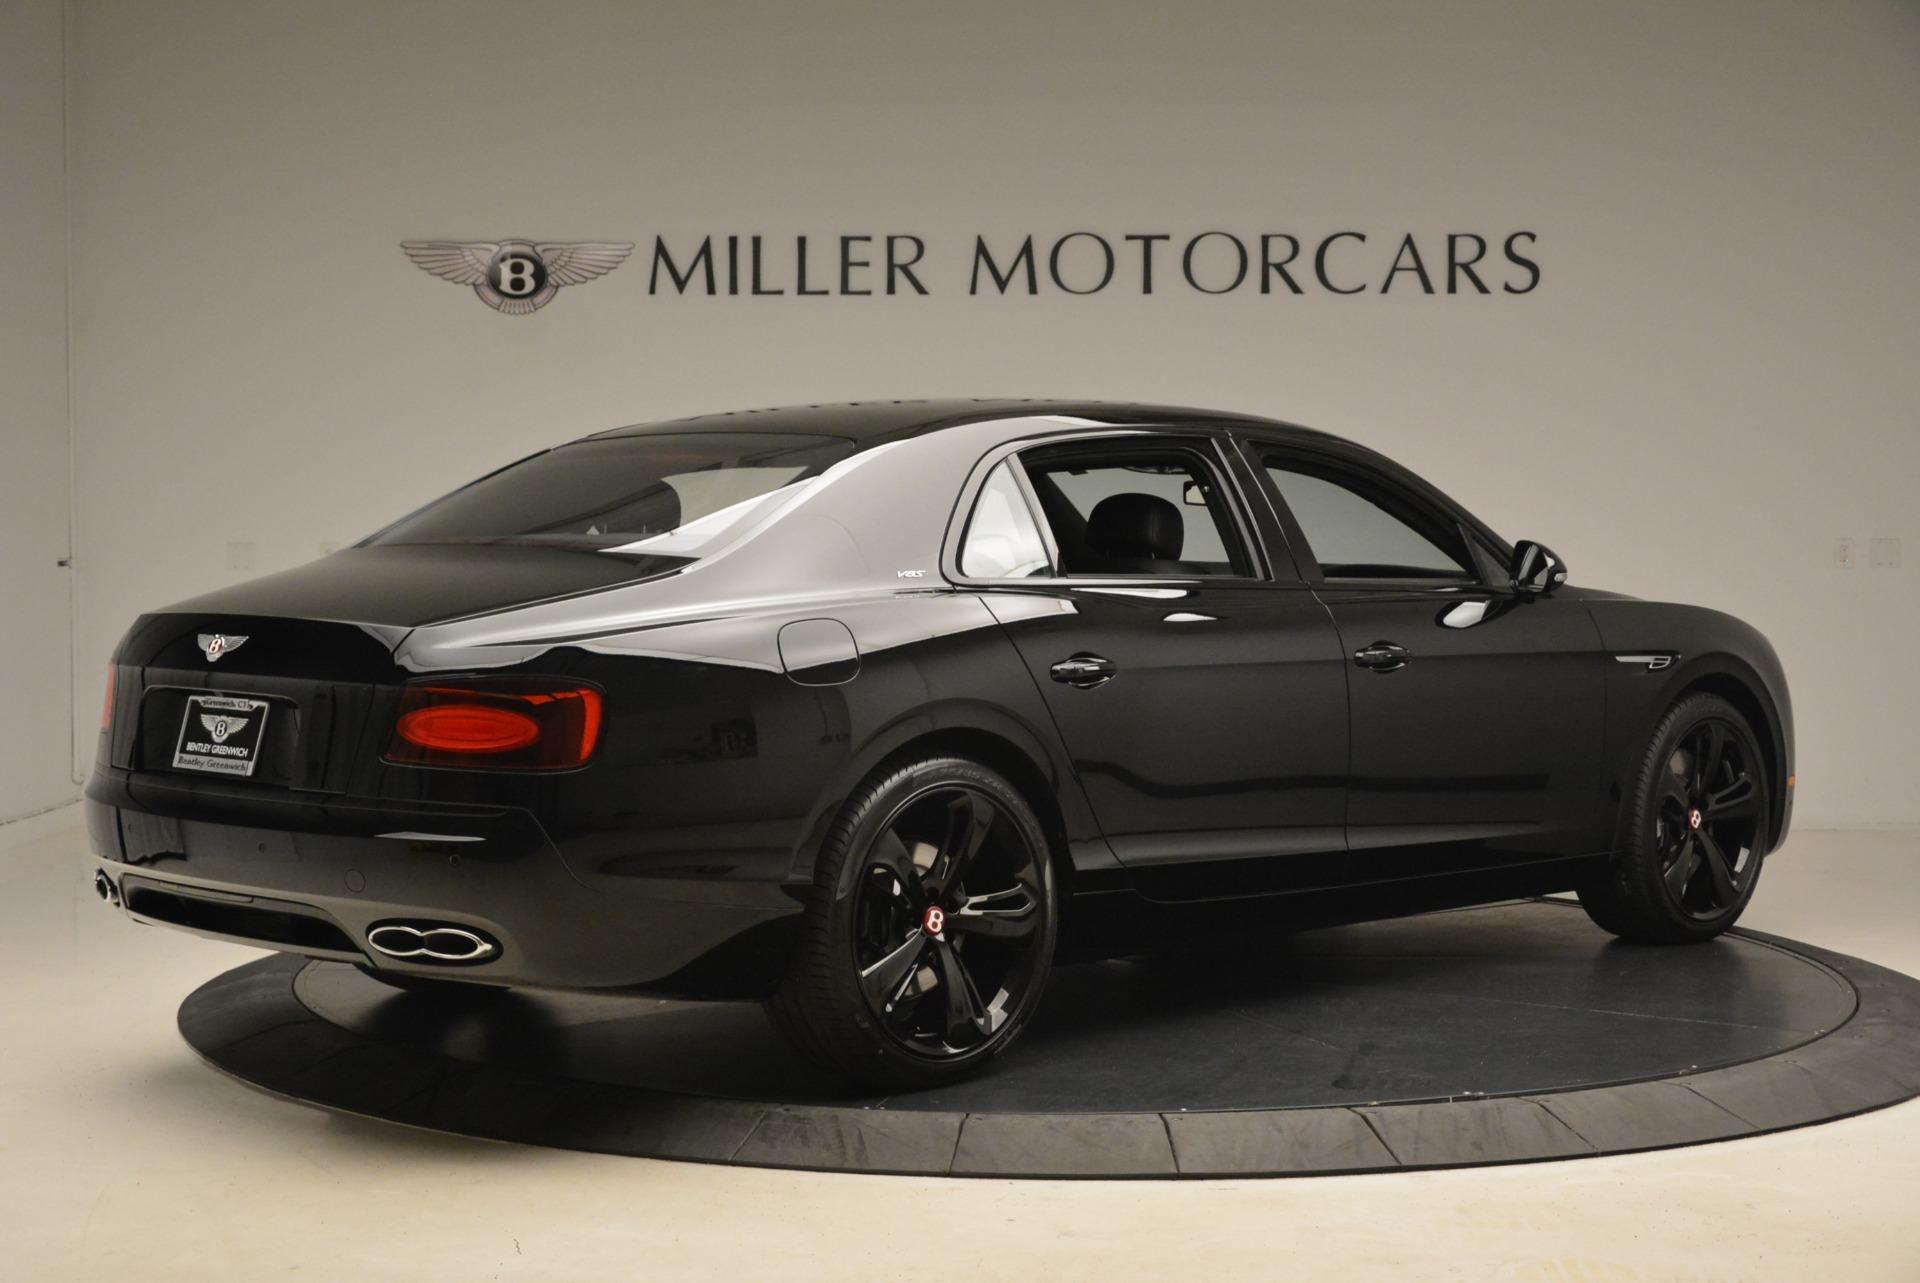 New 2018 Bentley Flying Spur V8 S Black Edition For Sale In Westport, CT 2073_p8